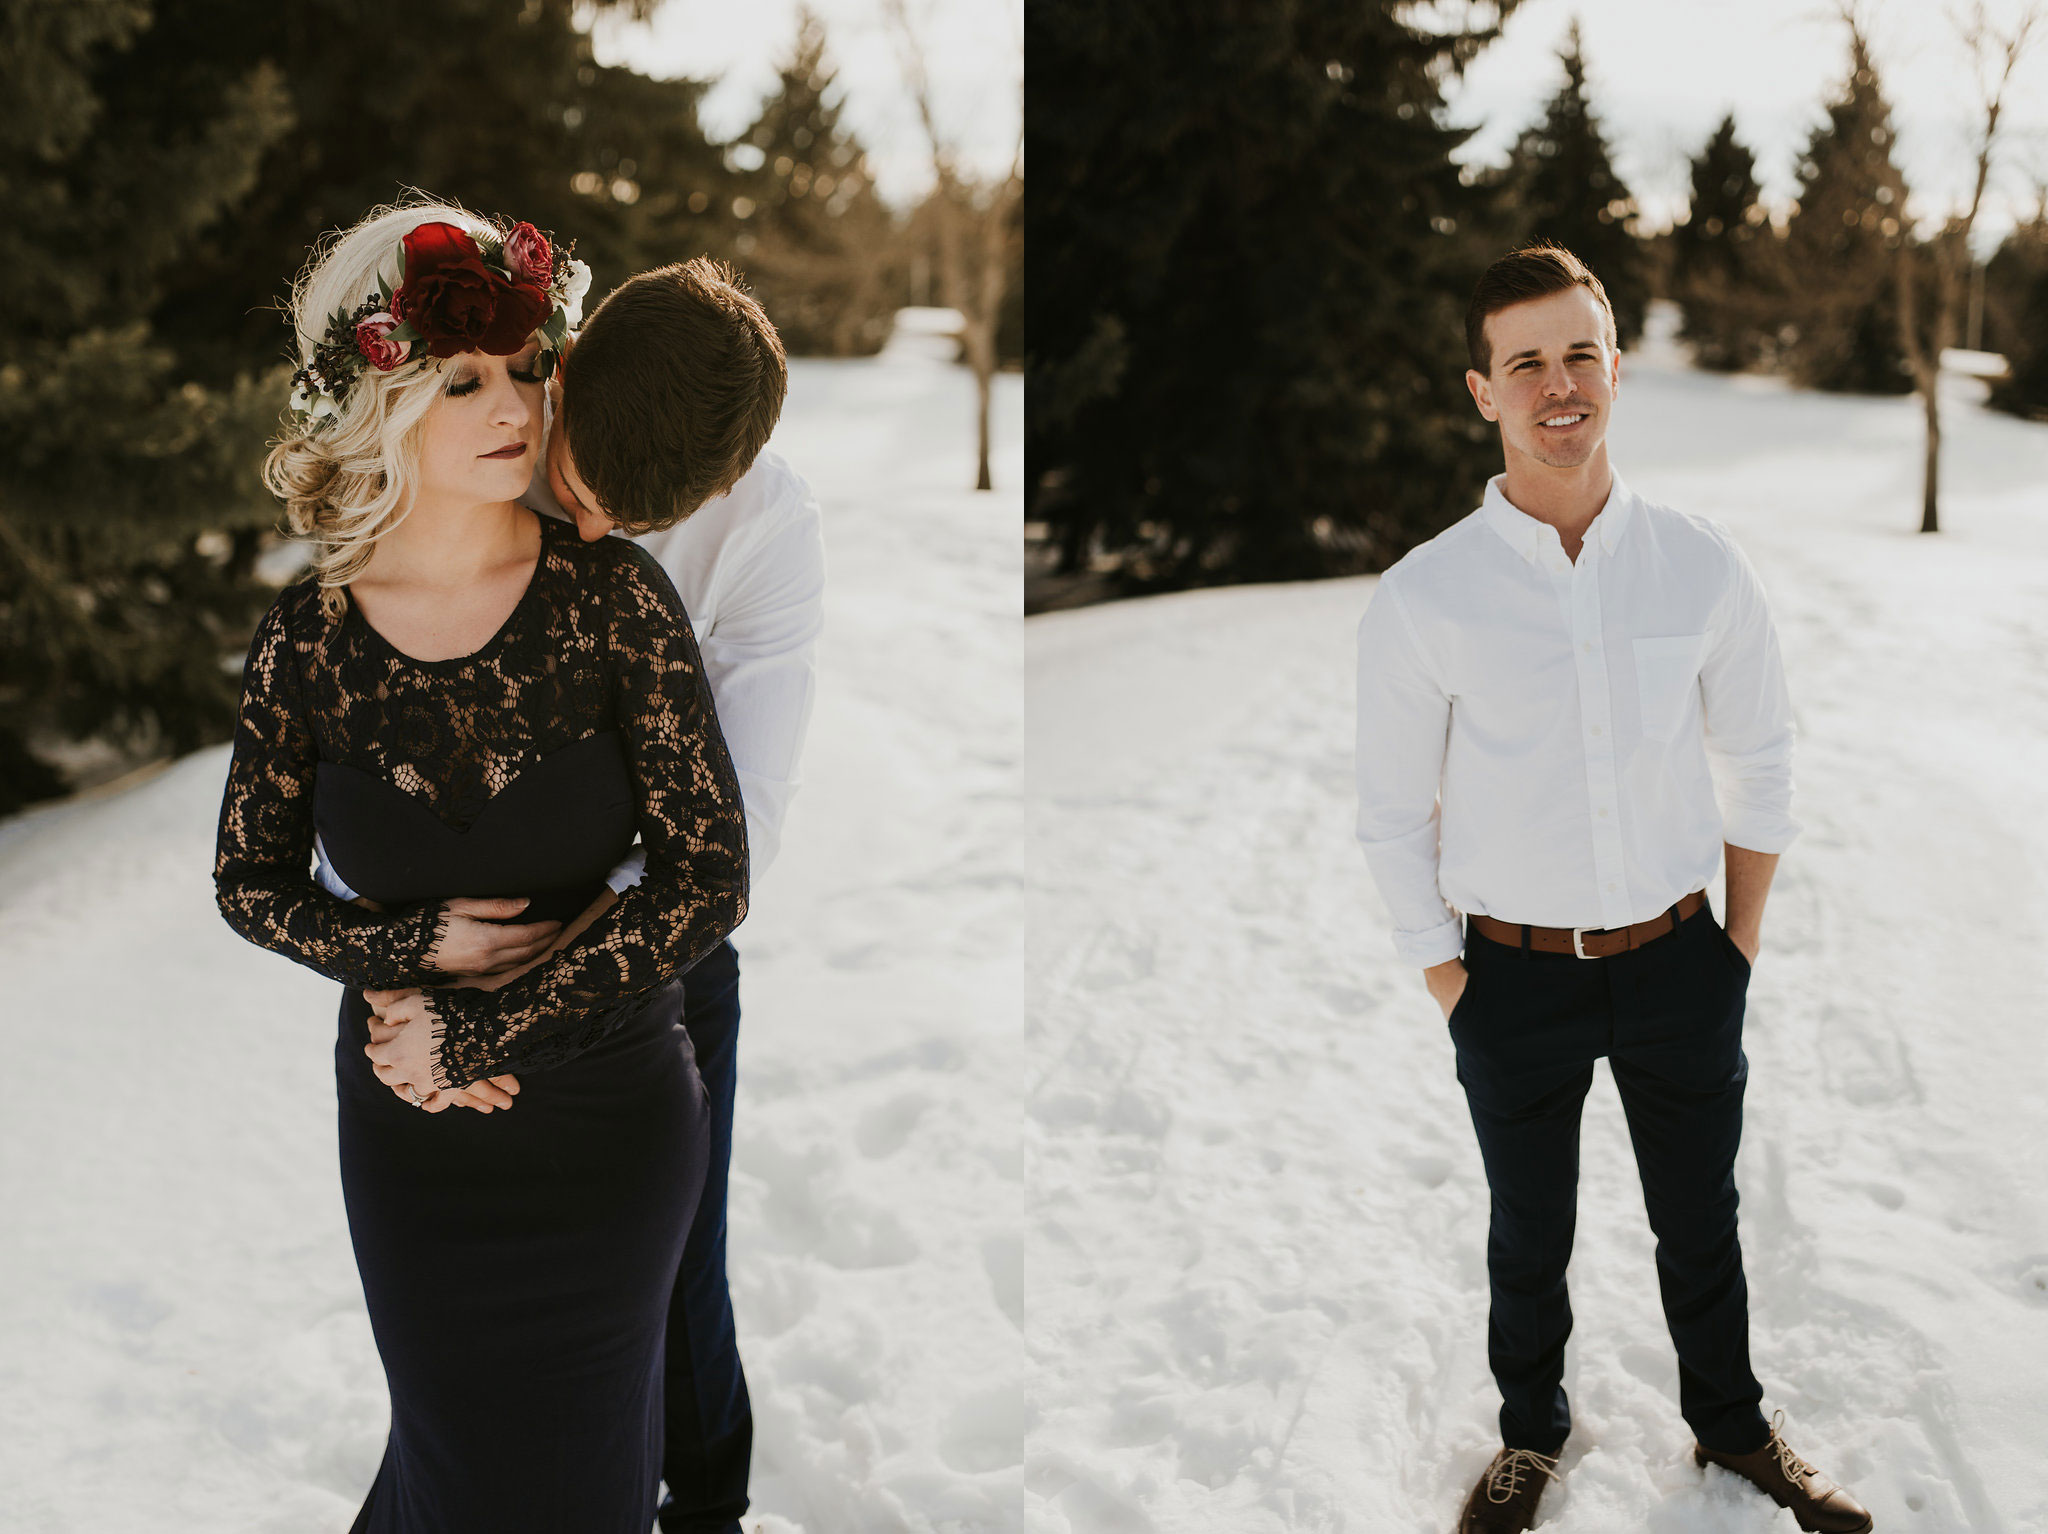 winter-wedding-montana-photographer-1.jpg